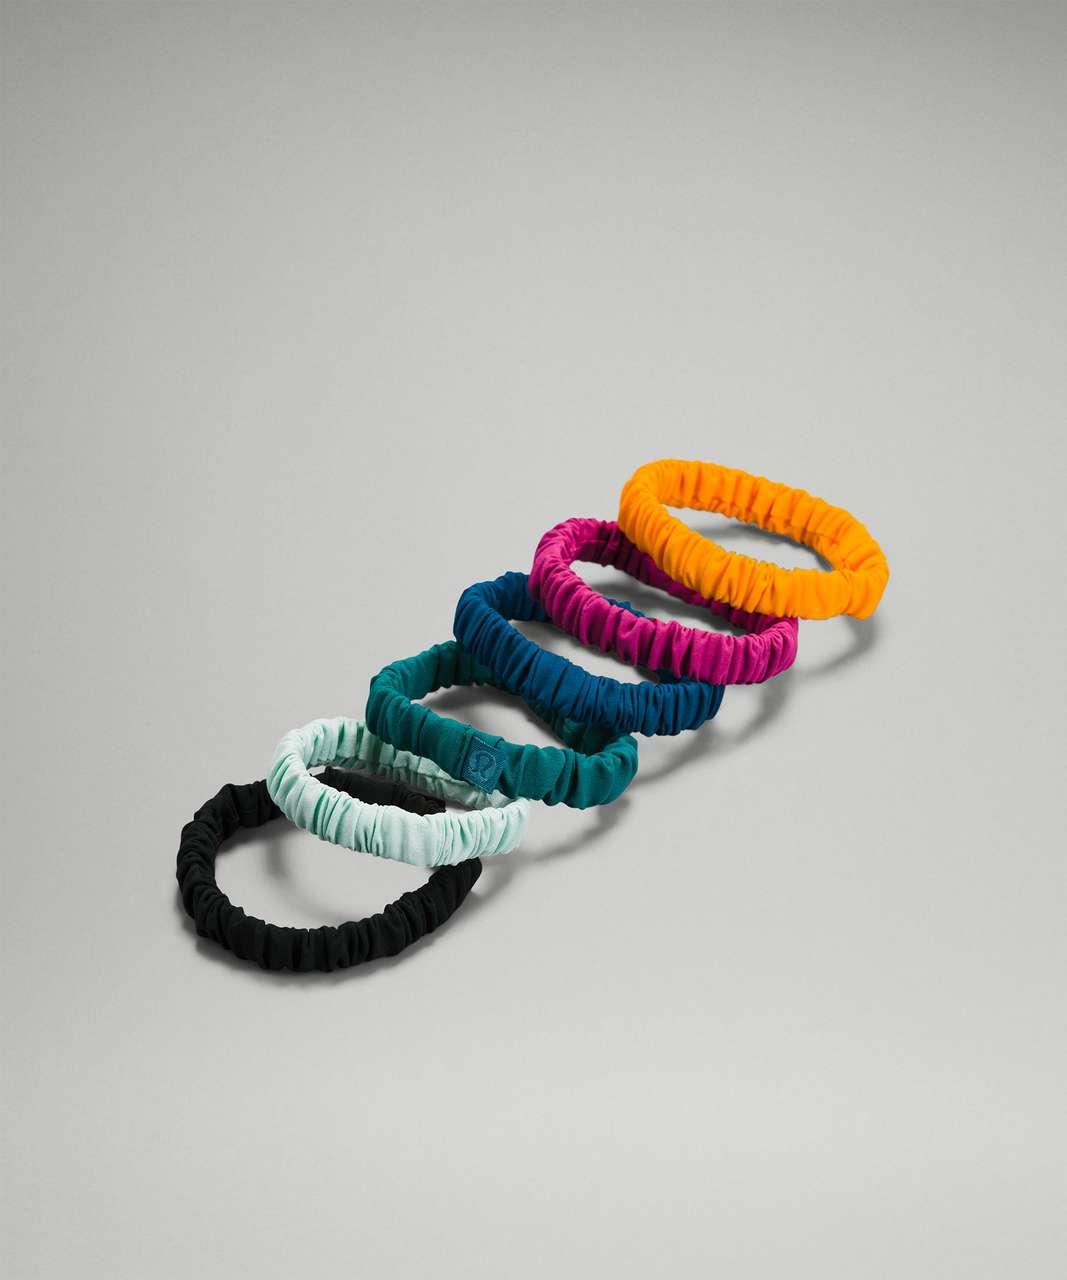 Lululemon Skinny Scrunchie *6 Pack - Rainforest Green / Capri / Delicate Mint / Teal Lagoon / Pink Lychee / Clementine